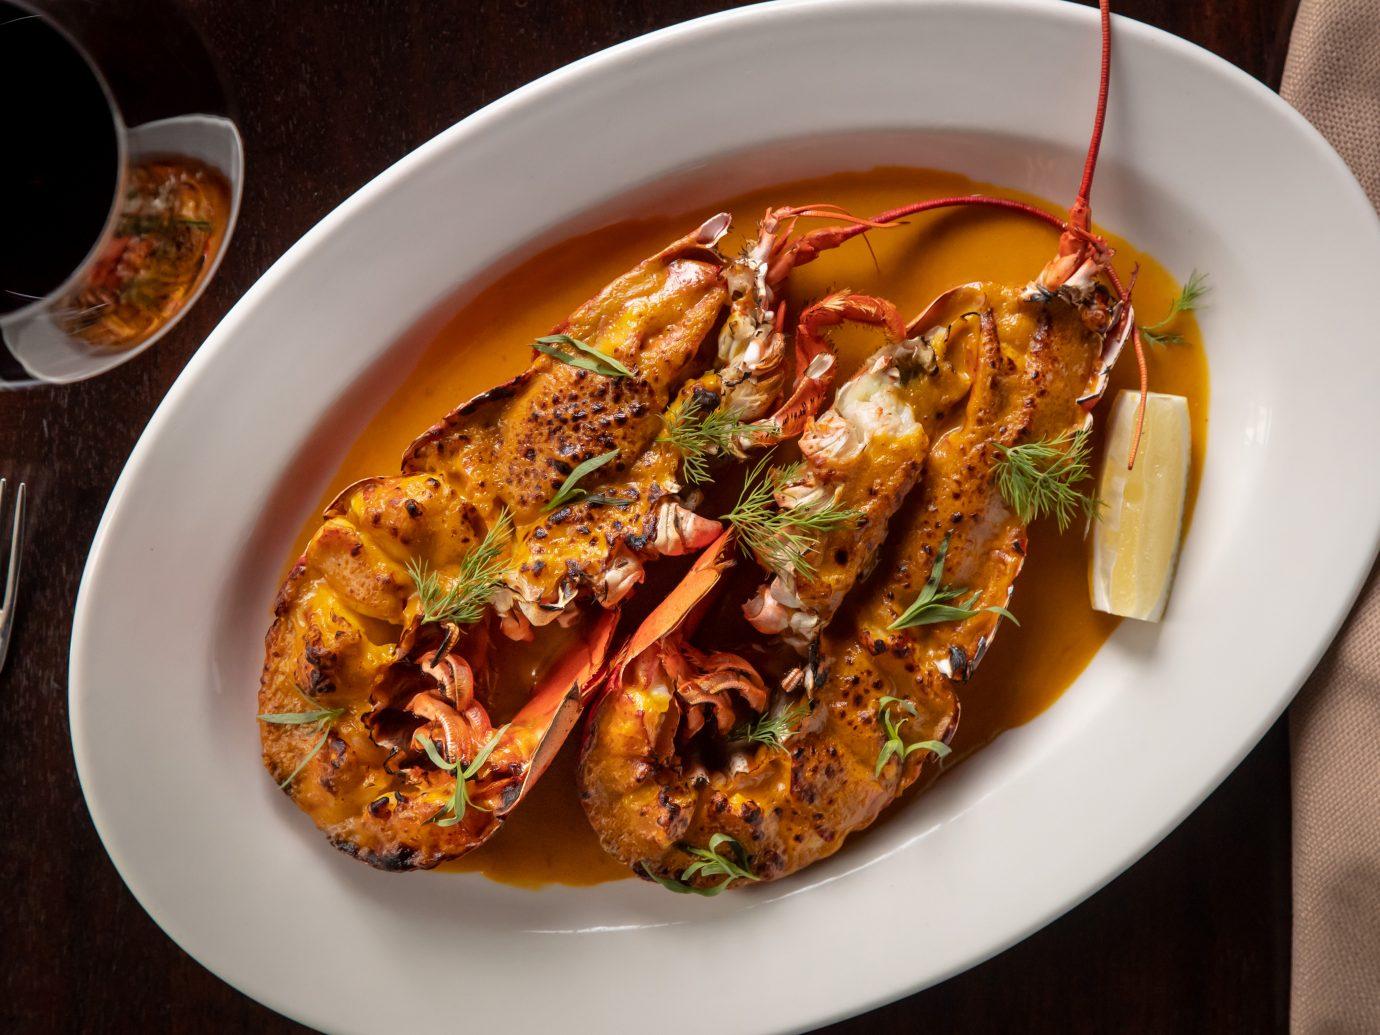 crustacean in an orange sauce